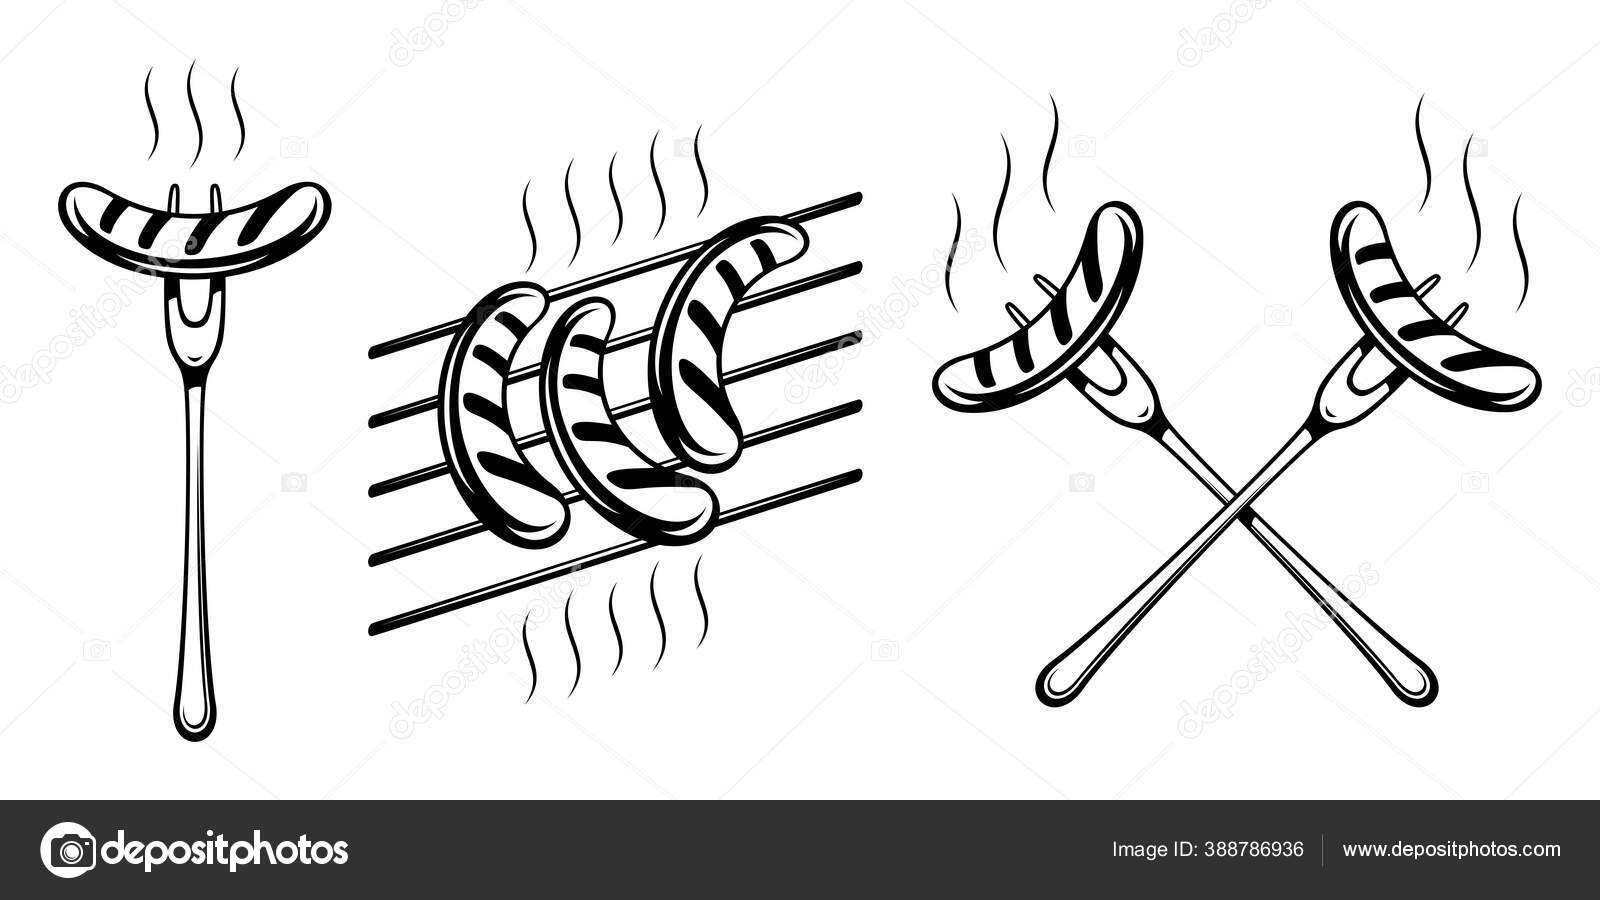 bavarian grilled sausage fork grill grate forks sausages crossed traditional stock vector c alxr 388786936 https depositphotos com 388786936 stock illustration bavarian grilled sausage fork grill html